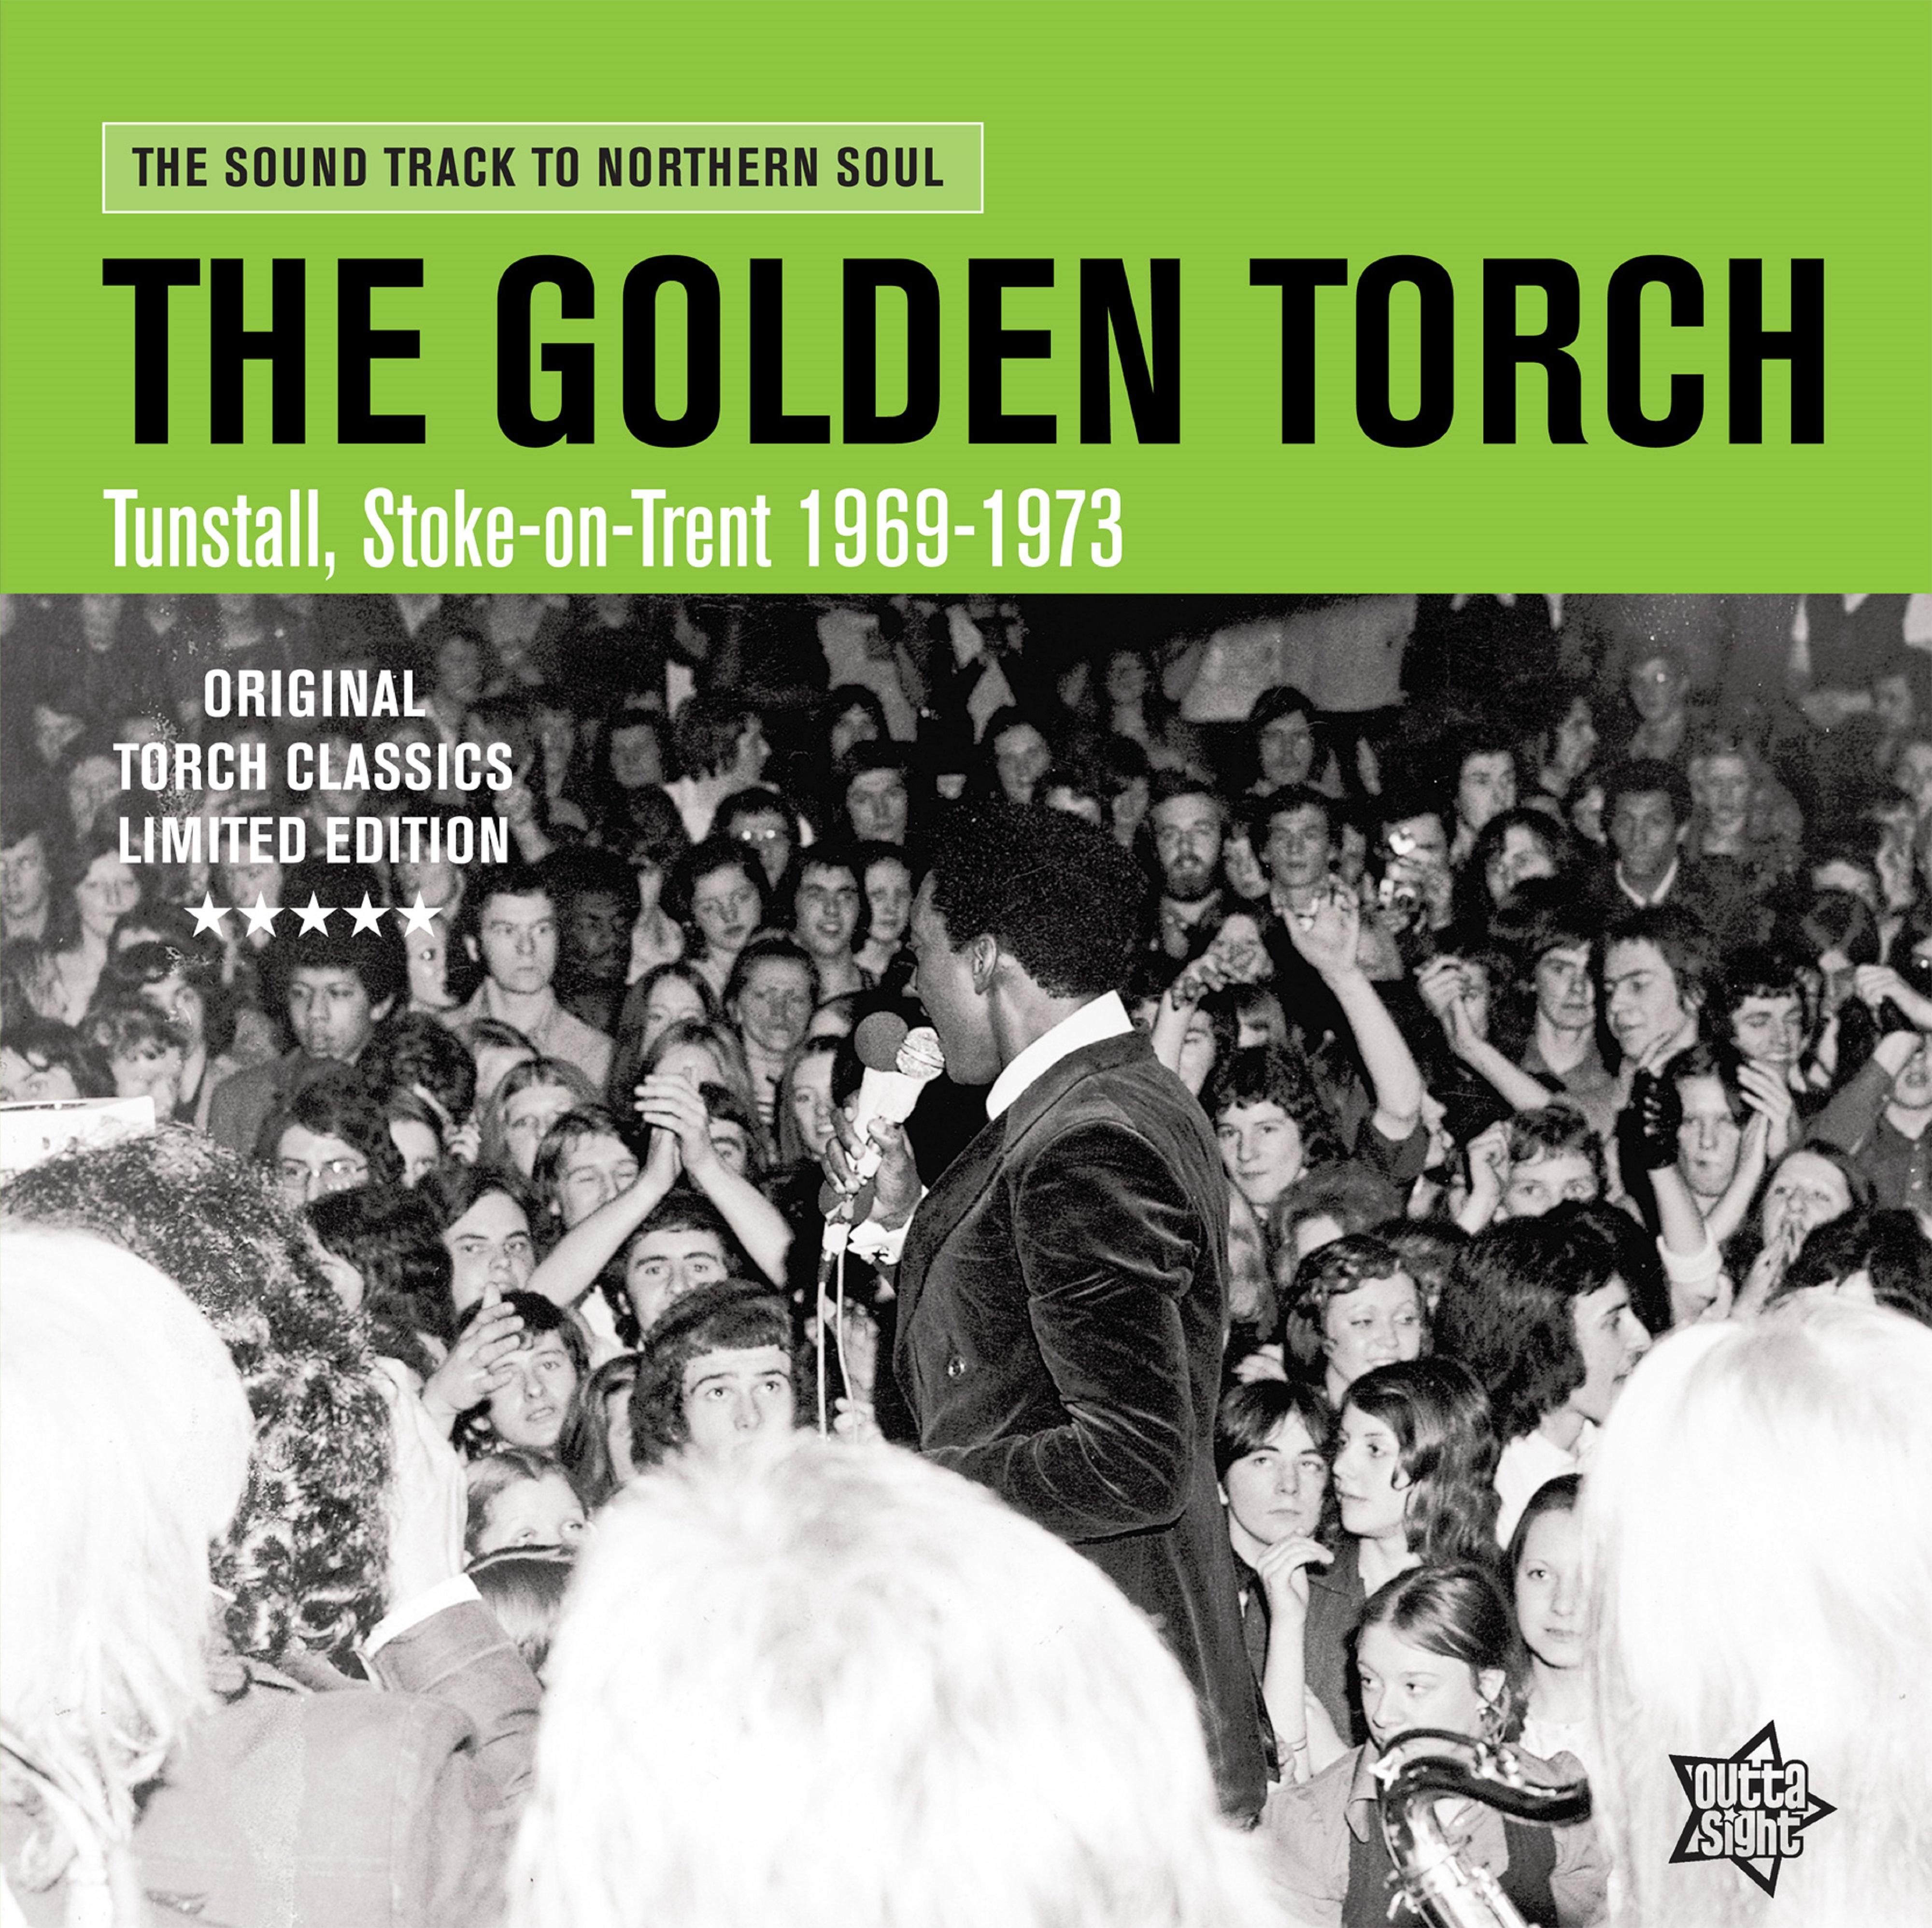 Northern Soul/GOLDEN TORCH (1969-73) LP